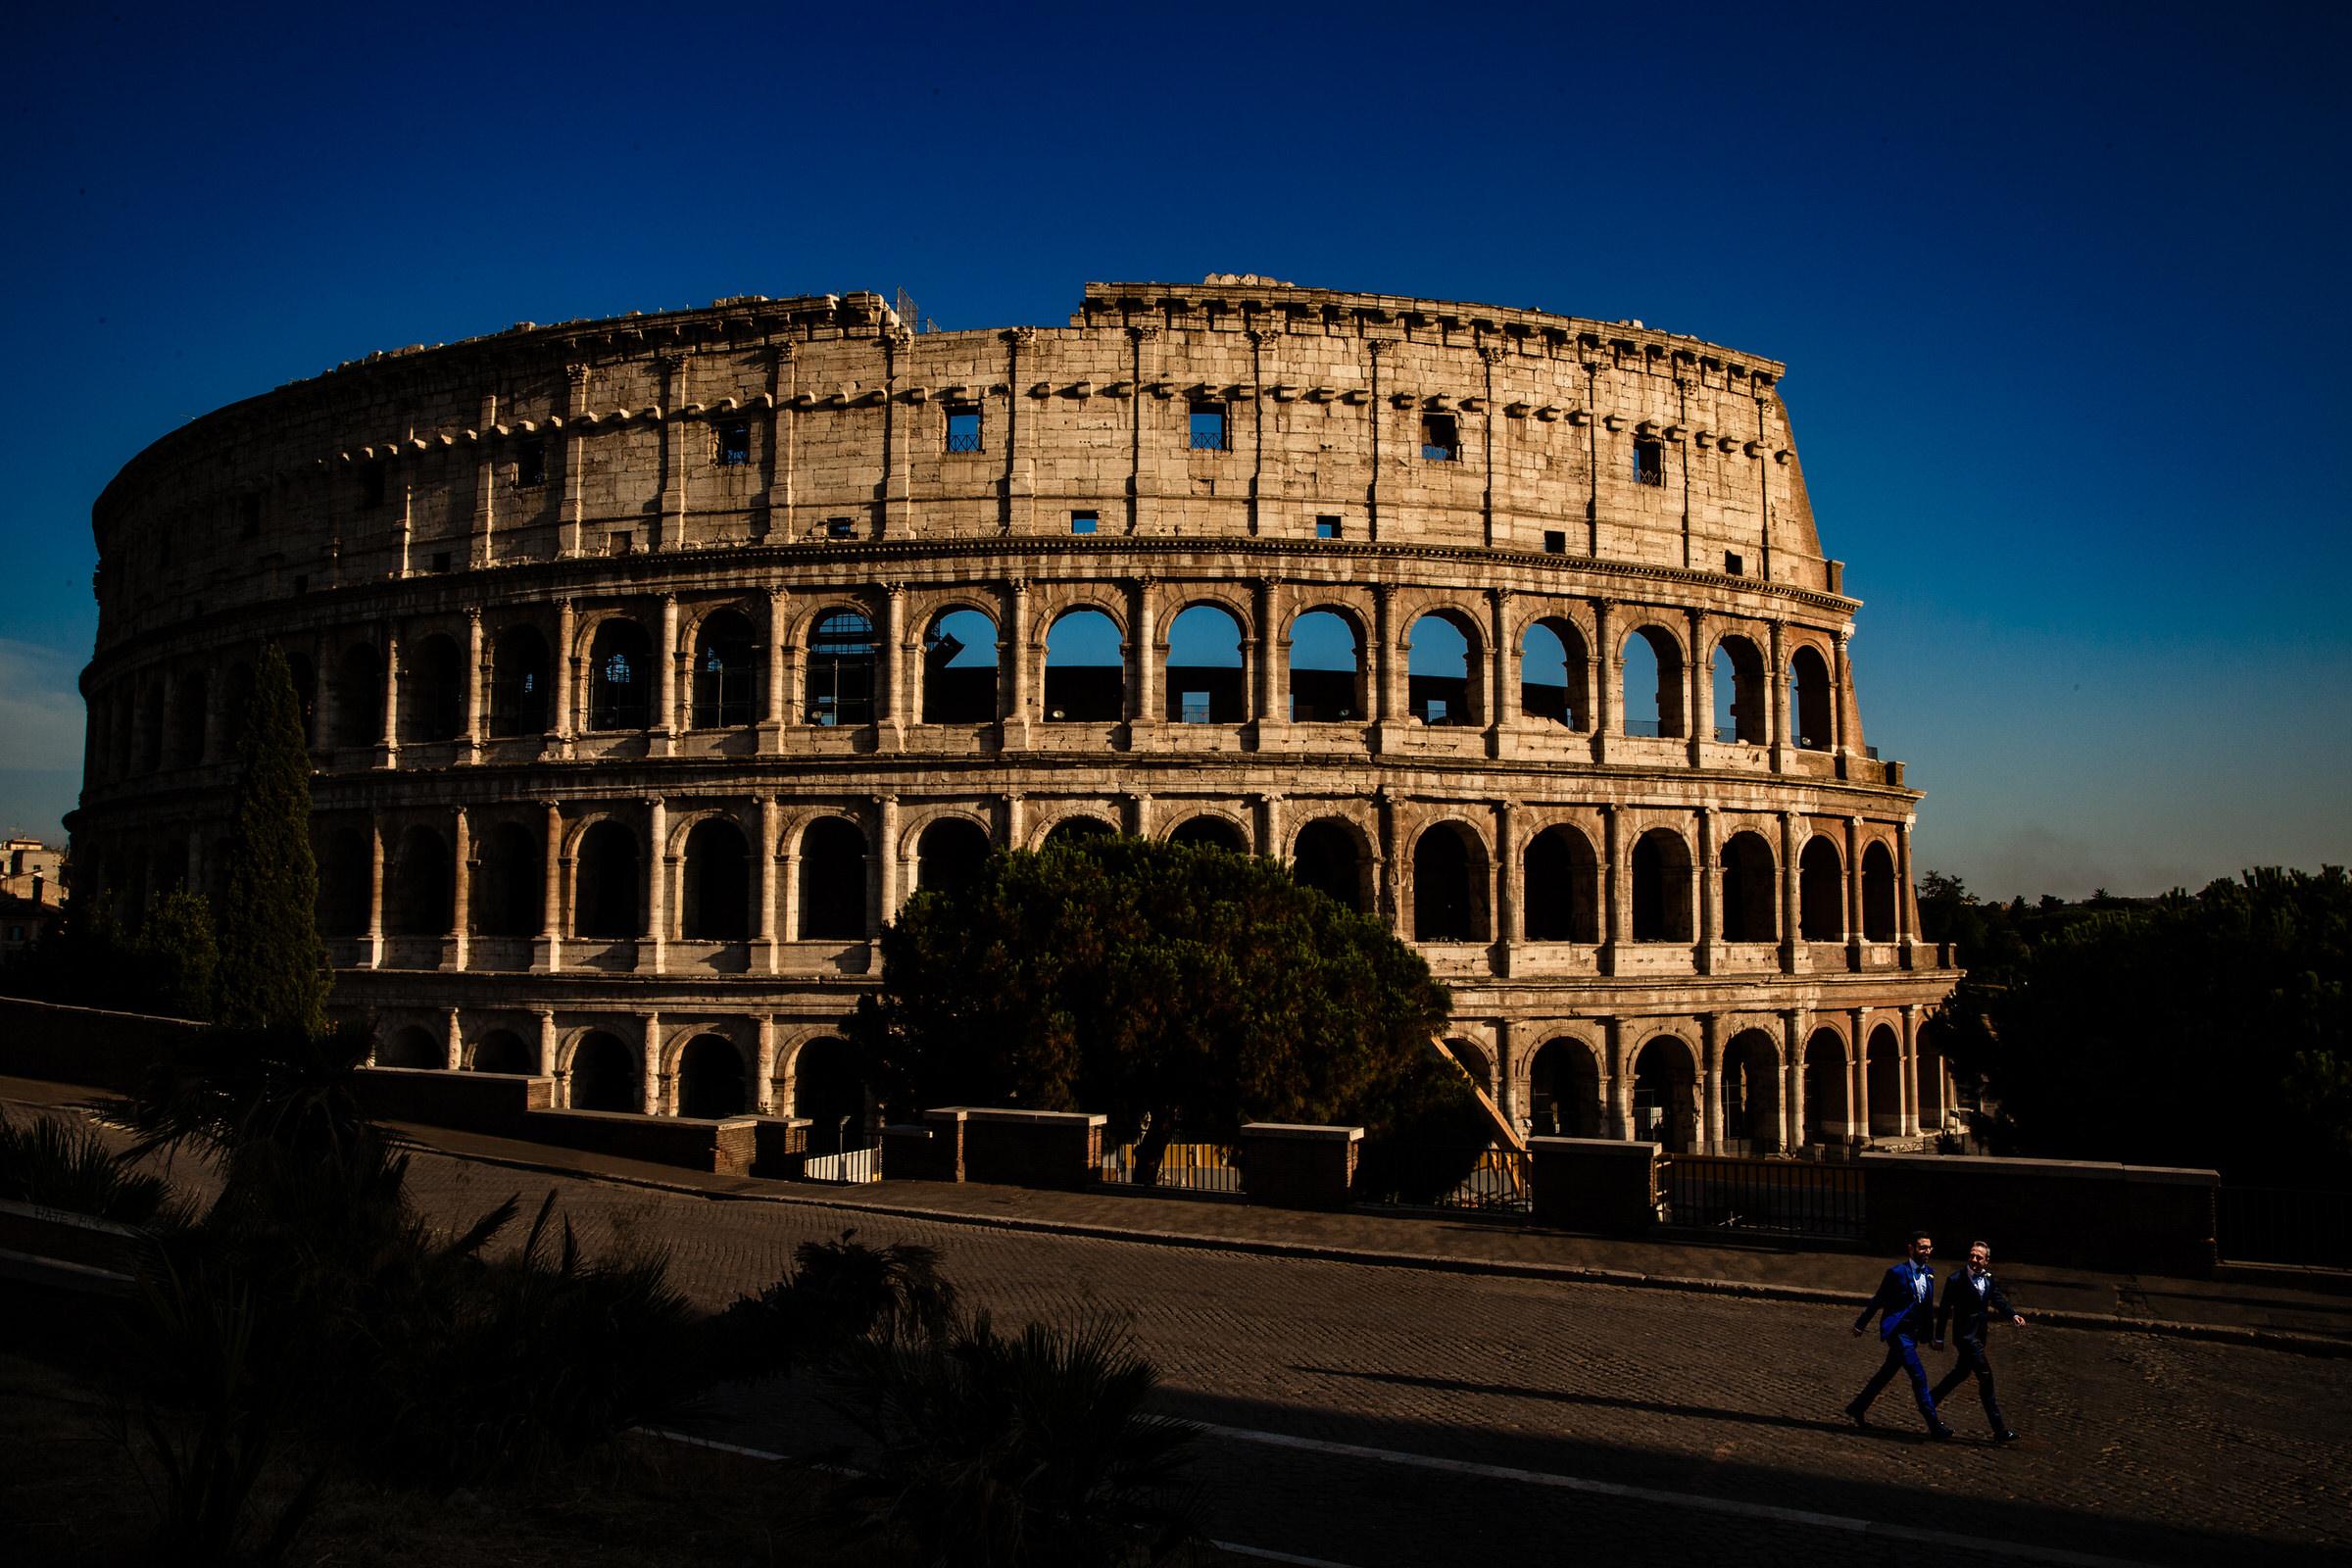 Grooms walking near coliseum - photo by Luca + Marta Gallizio Photography